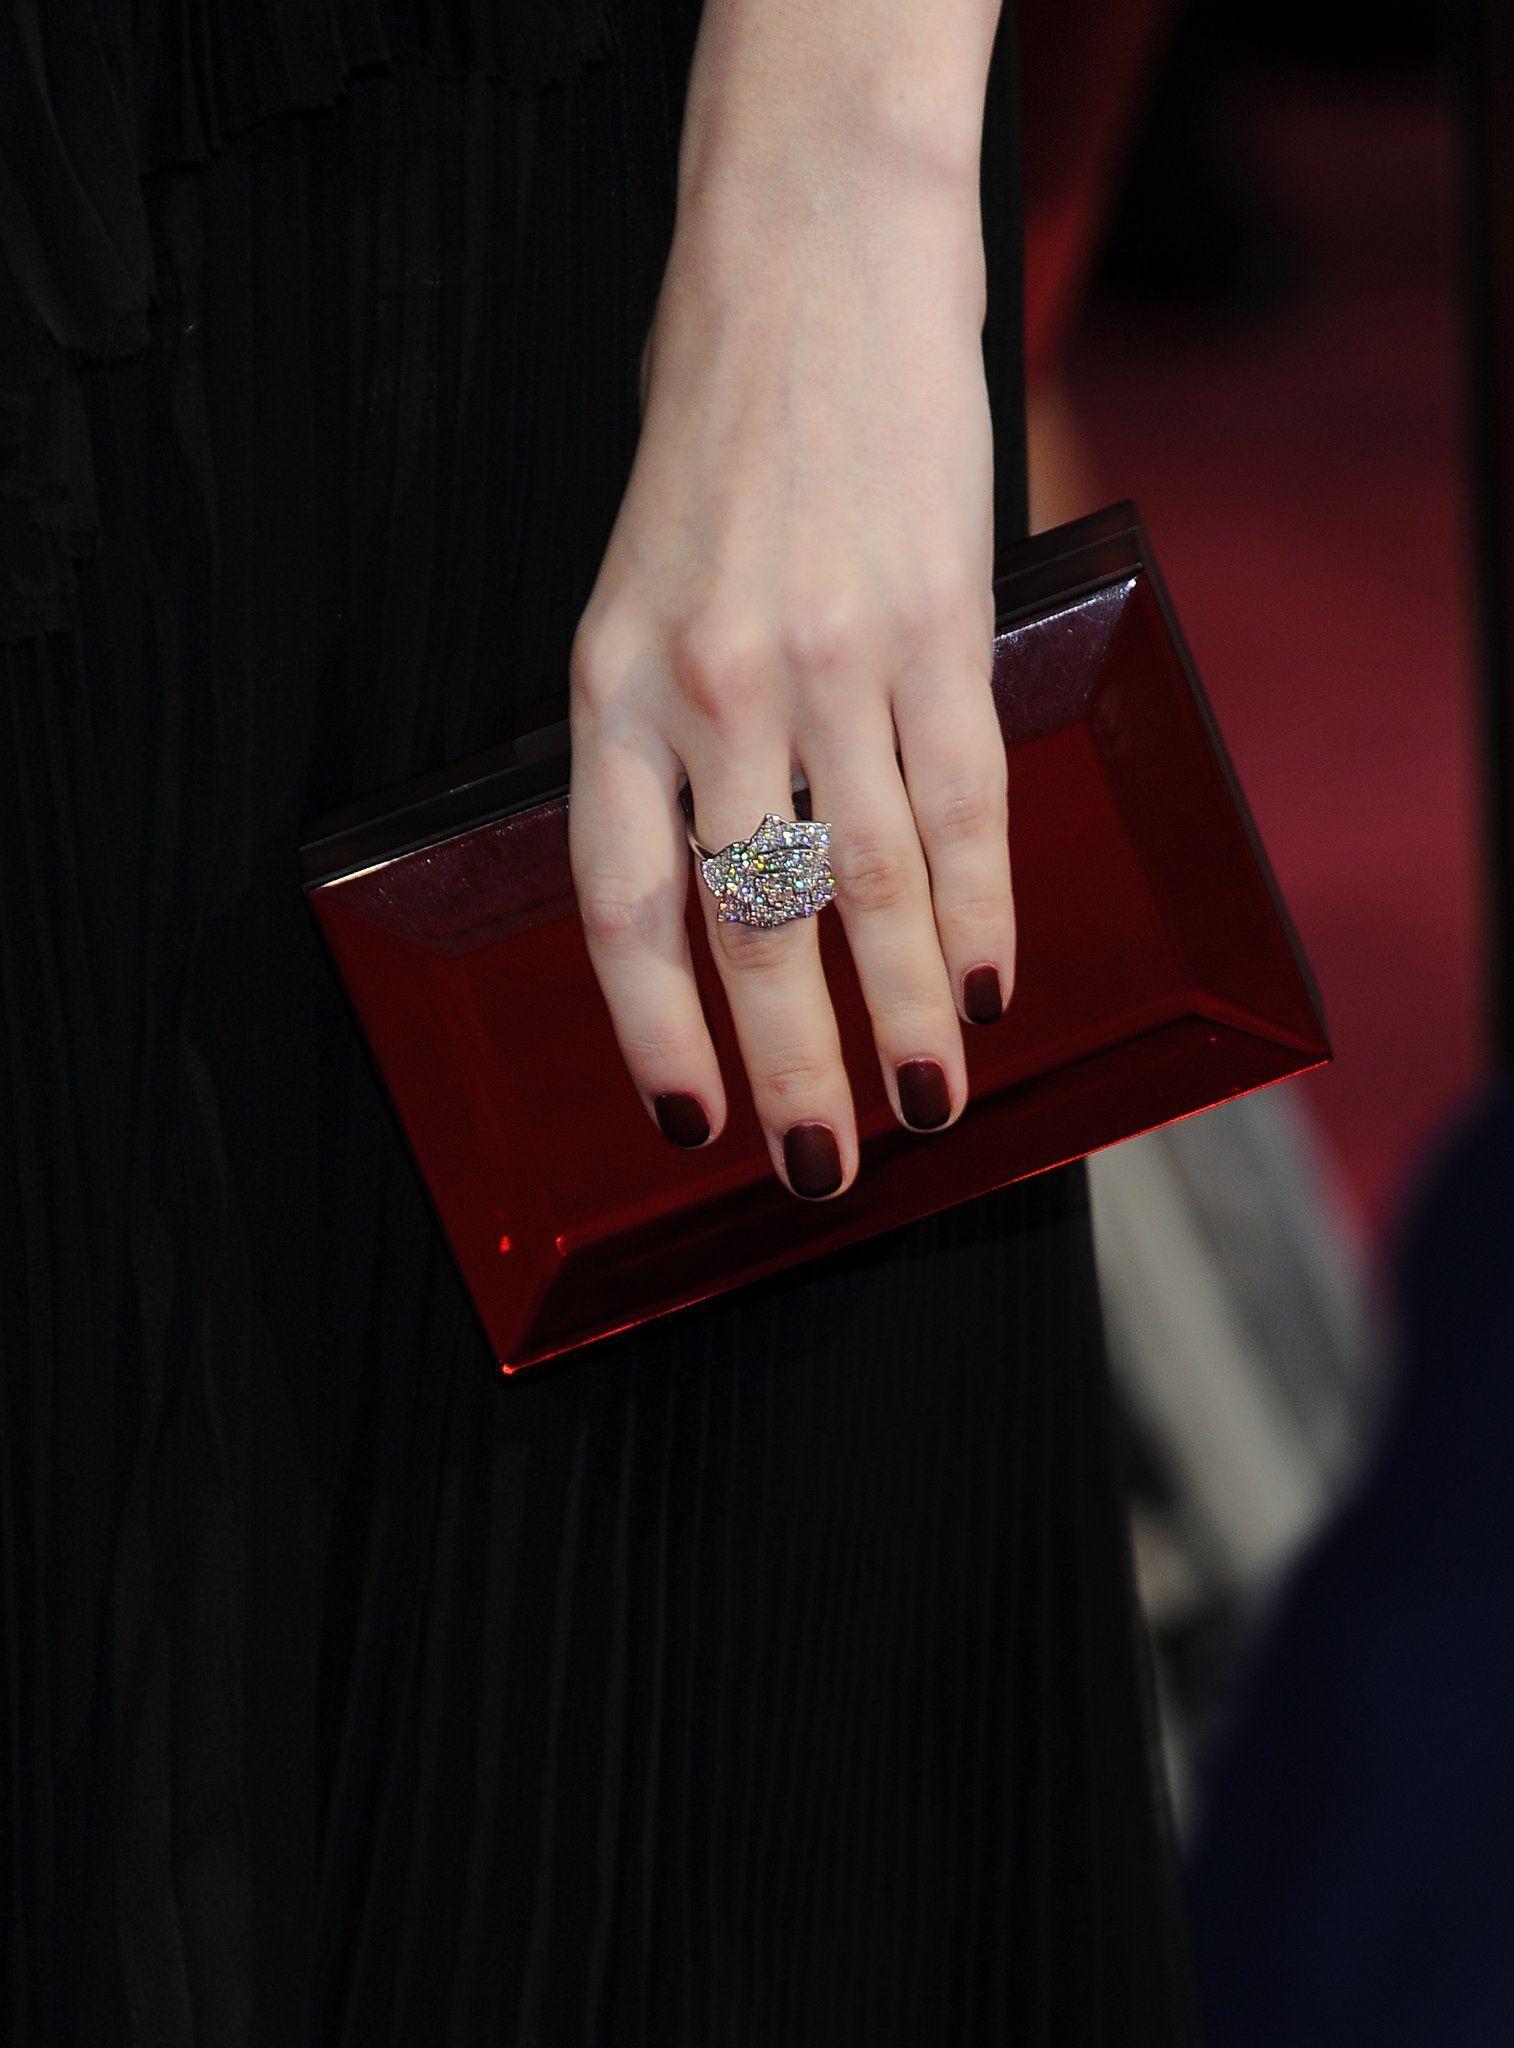 Anna Kendrick chose a deep, vampy red nail color at the Oscars. #AcademyAwards